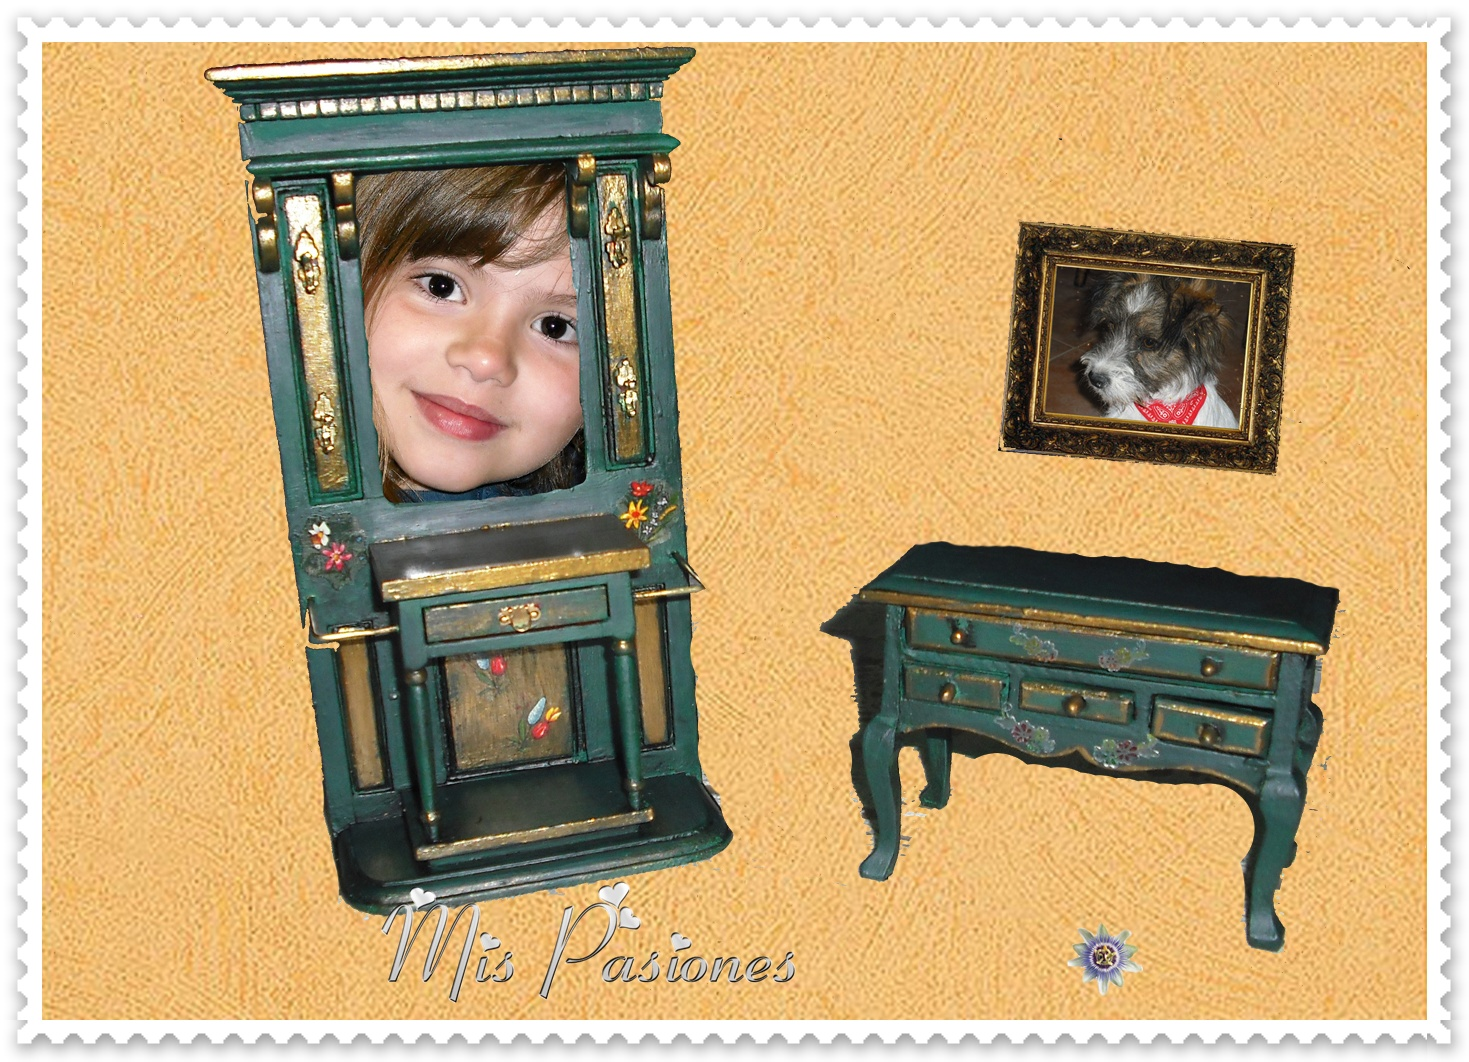 Las miniaturas de palmira muebles for Casa muebles palmira